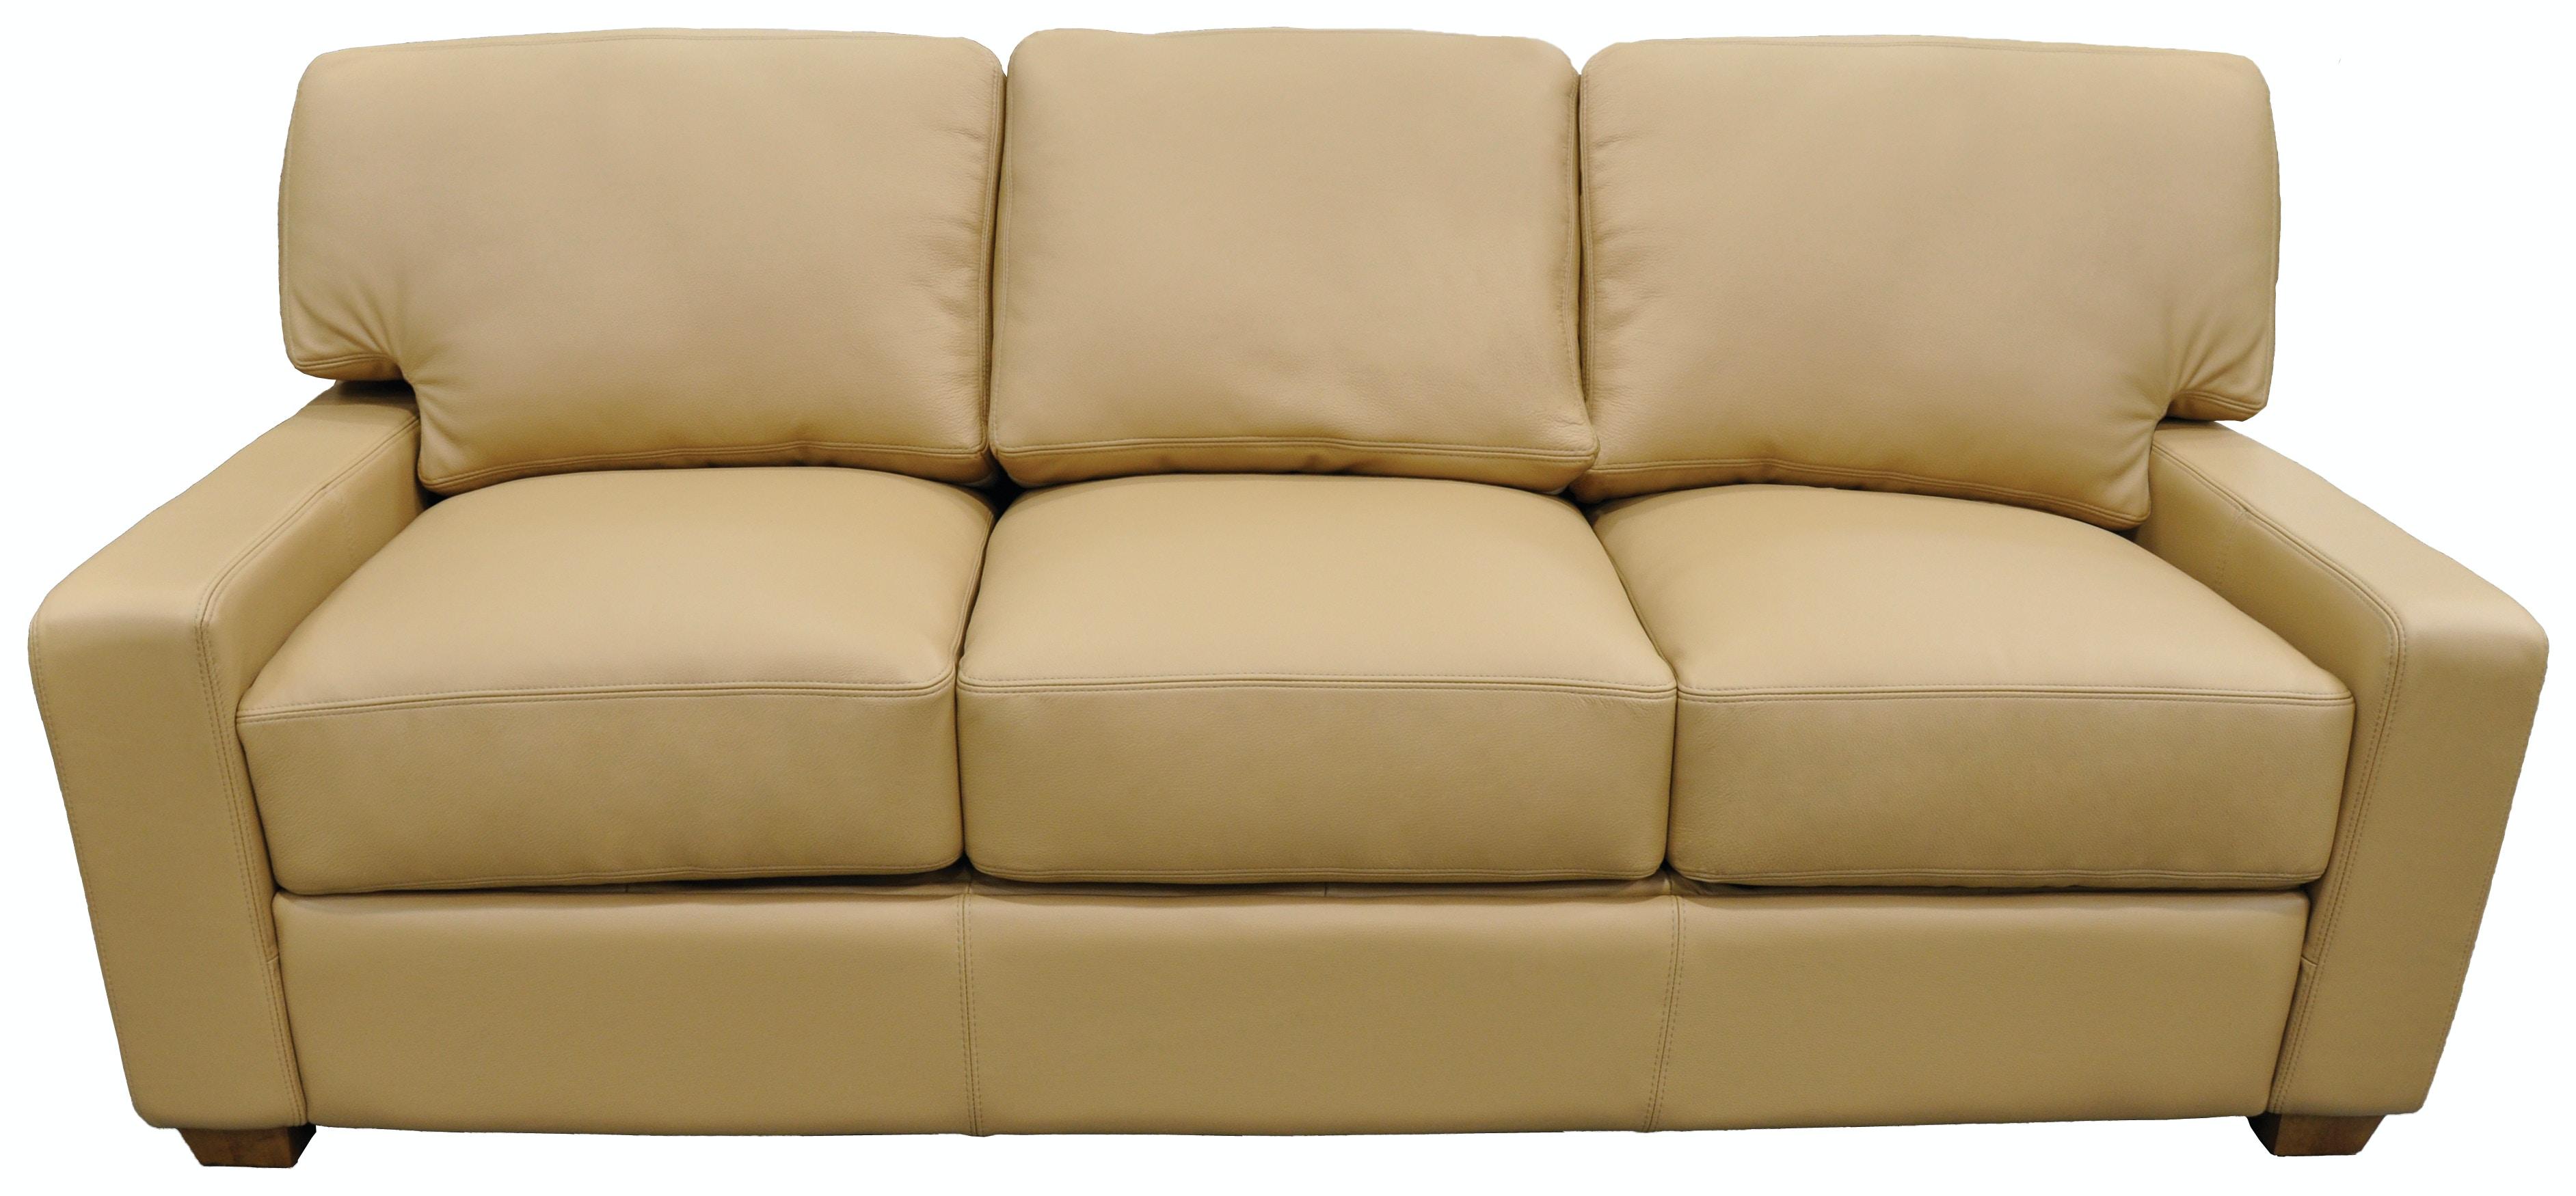 Wonderful Omnia Leather Albany Sofa Albany 3C SOFA  13001